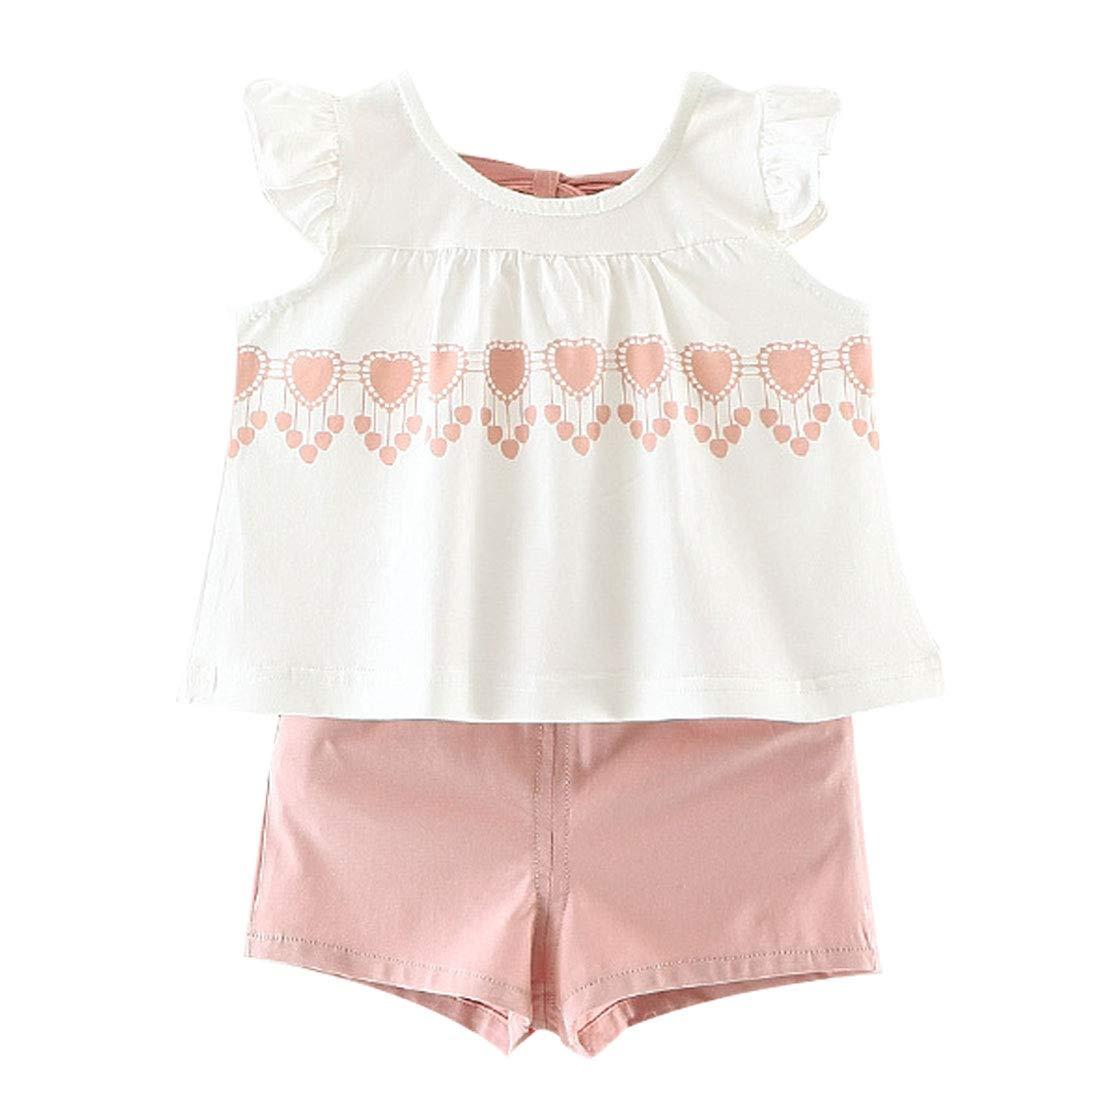 FCQNY Kid Girl Summer Outfits White Ruffle Sleeve Cotton Tee Tops+Shorts Set 2Pcs